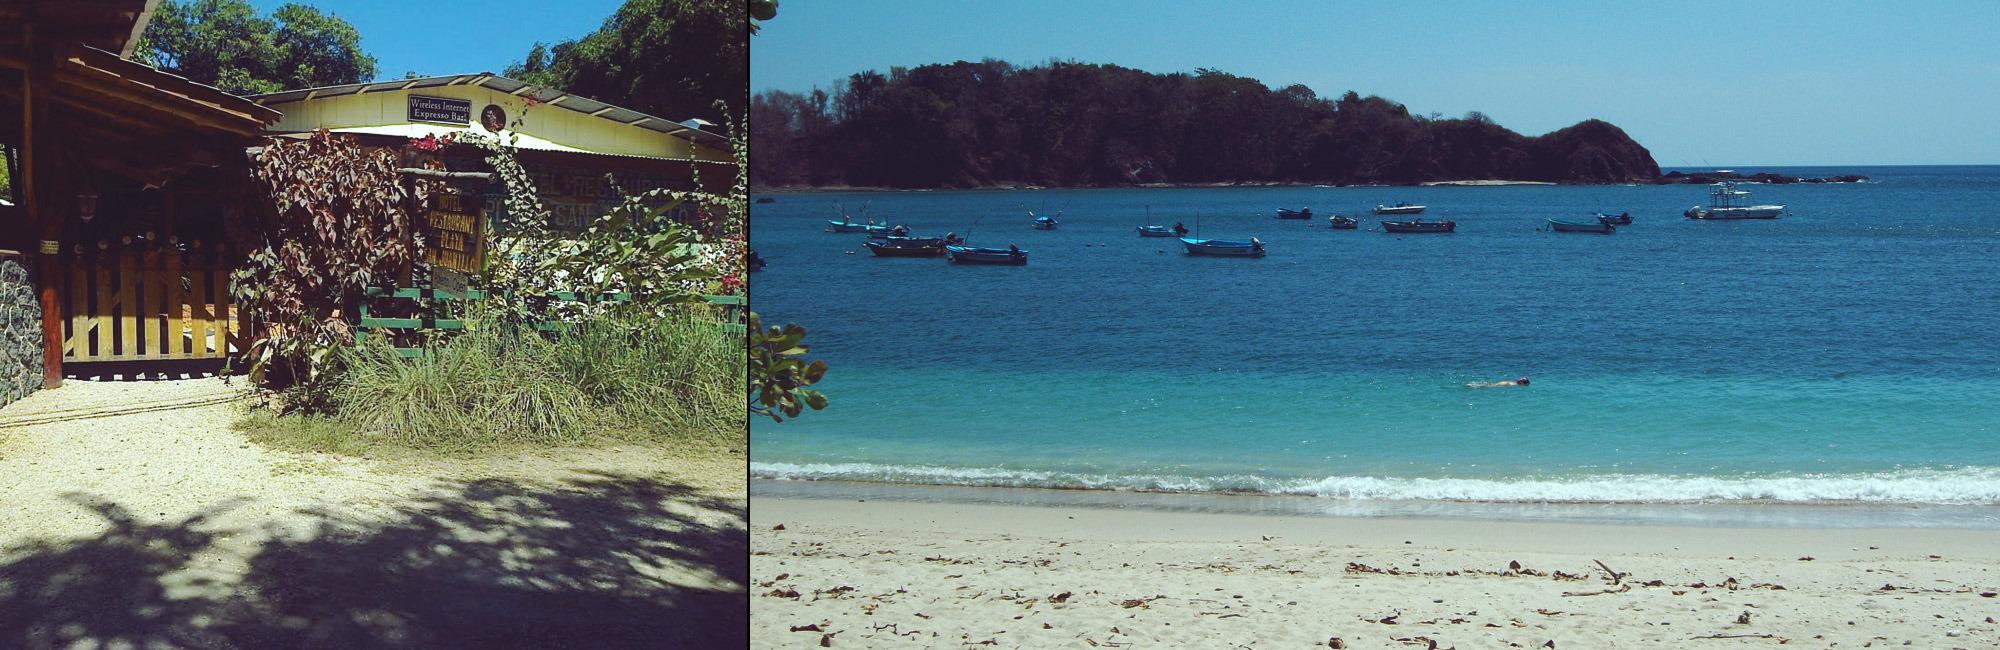 San Juanillo Snorkeling Tour | Monkey Quads | Costa Rica